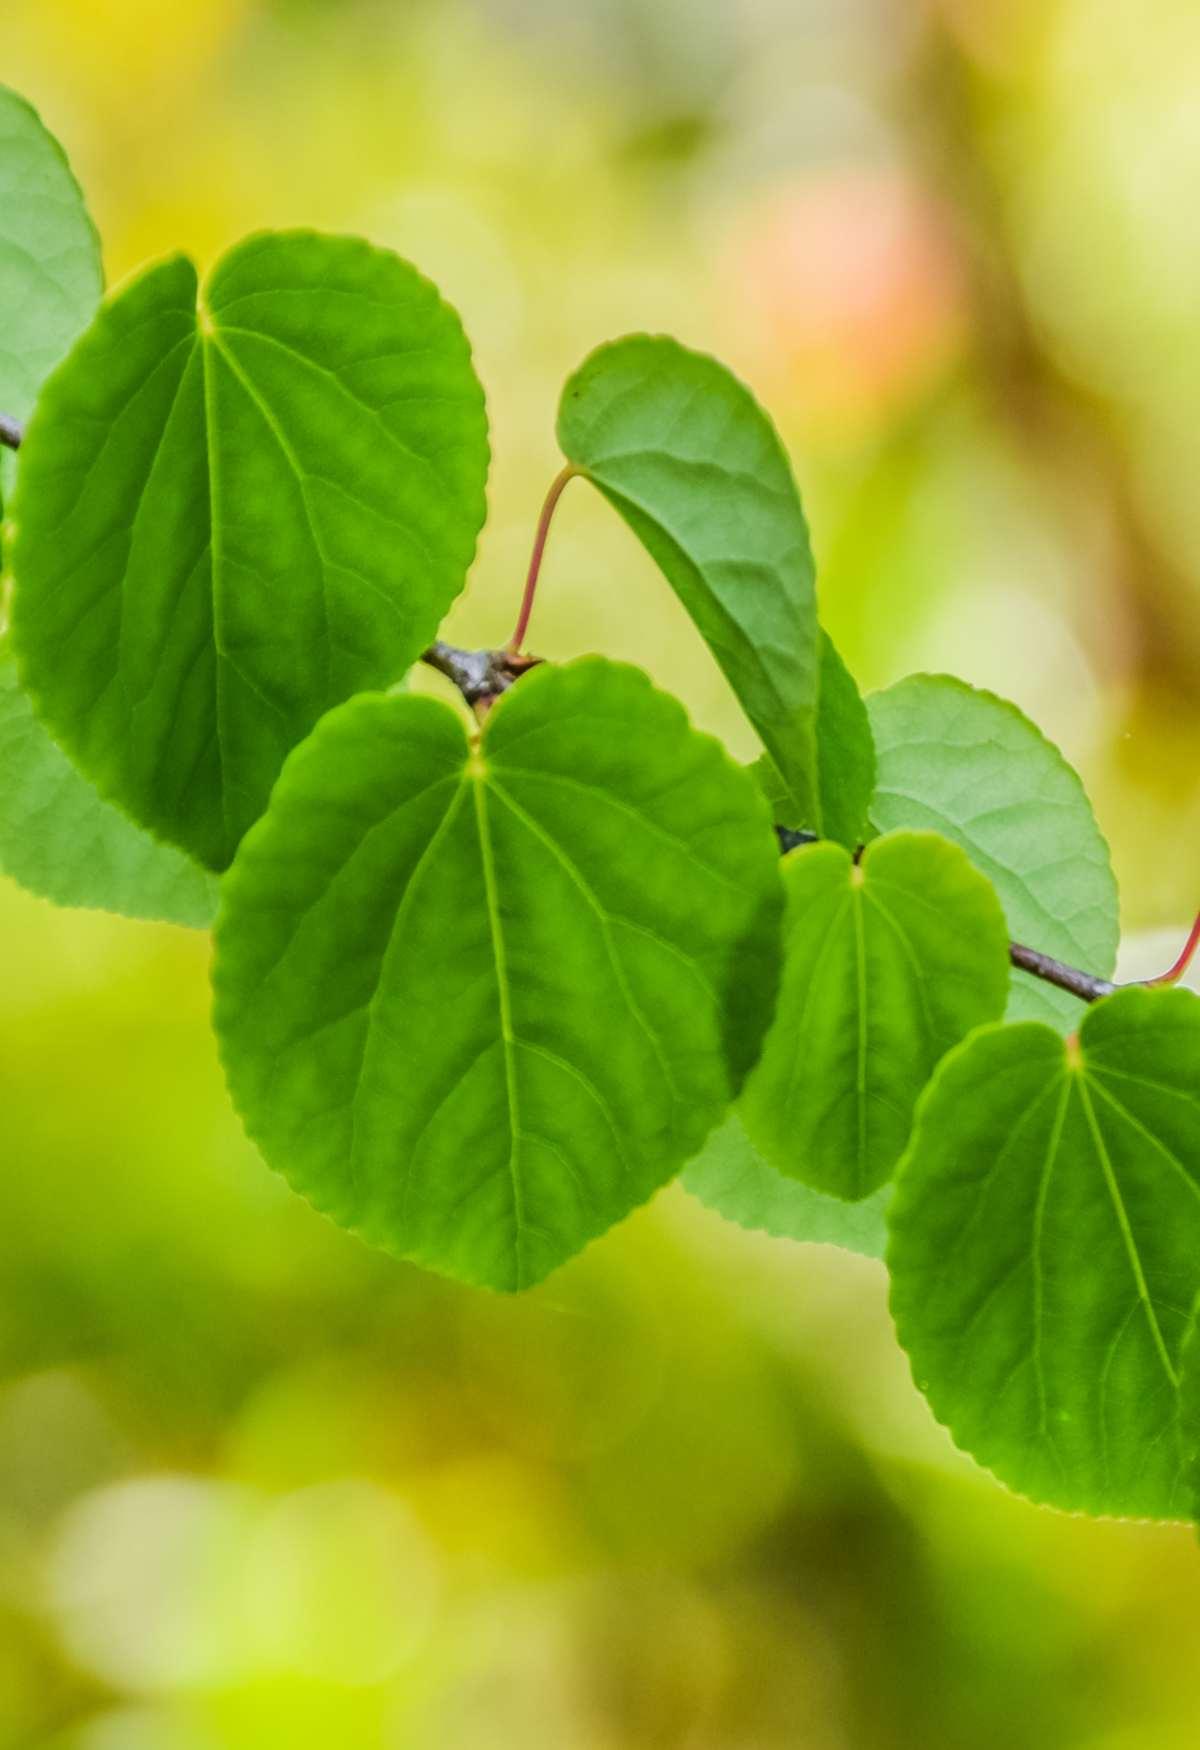 Preparing katsura cuttings – a quick way to propagate your Caramel tree!